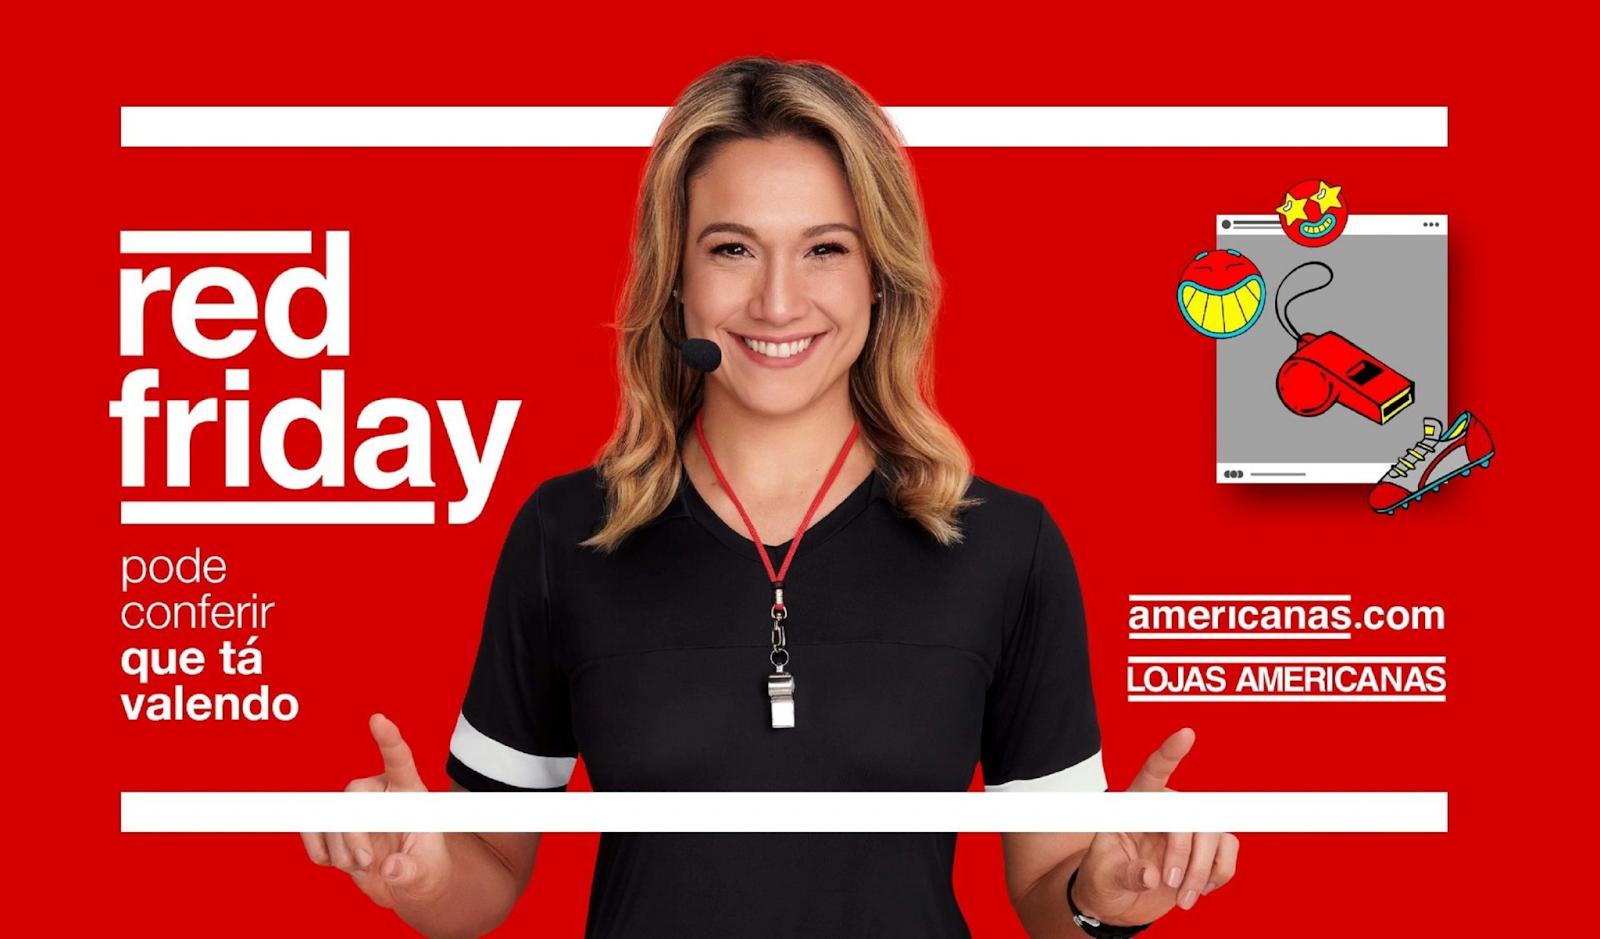 red friday - campanha